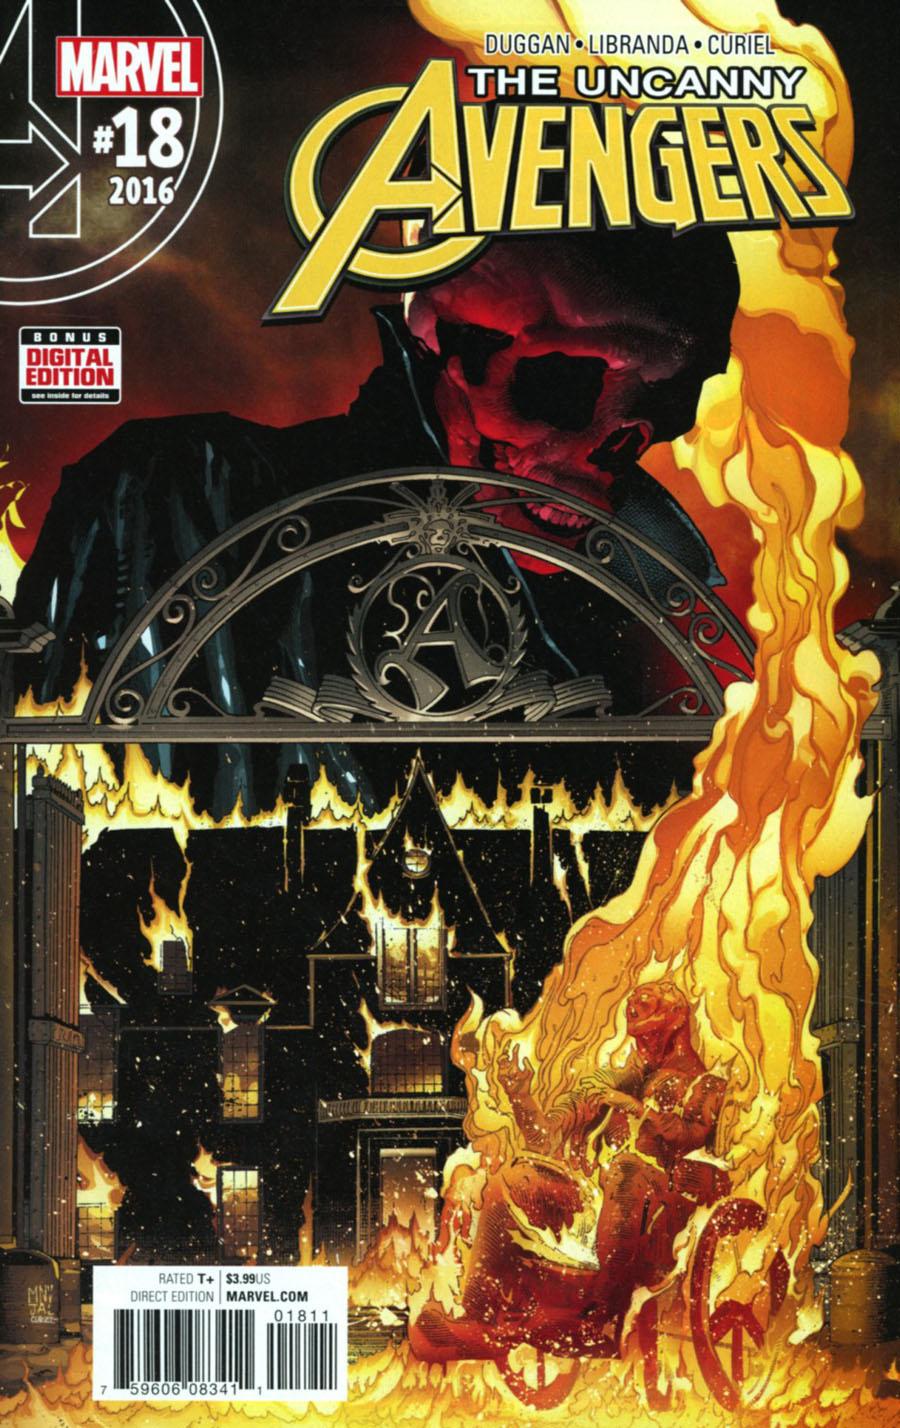 Uncanny Avengers Vol 3 #18